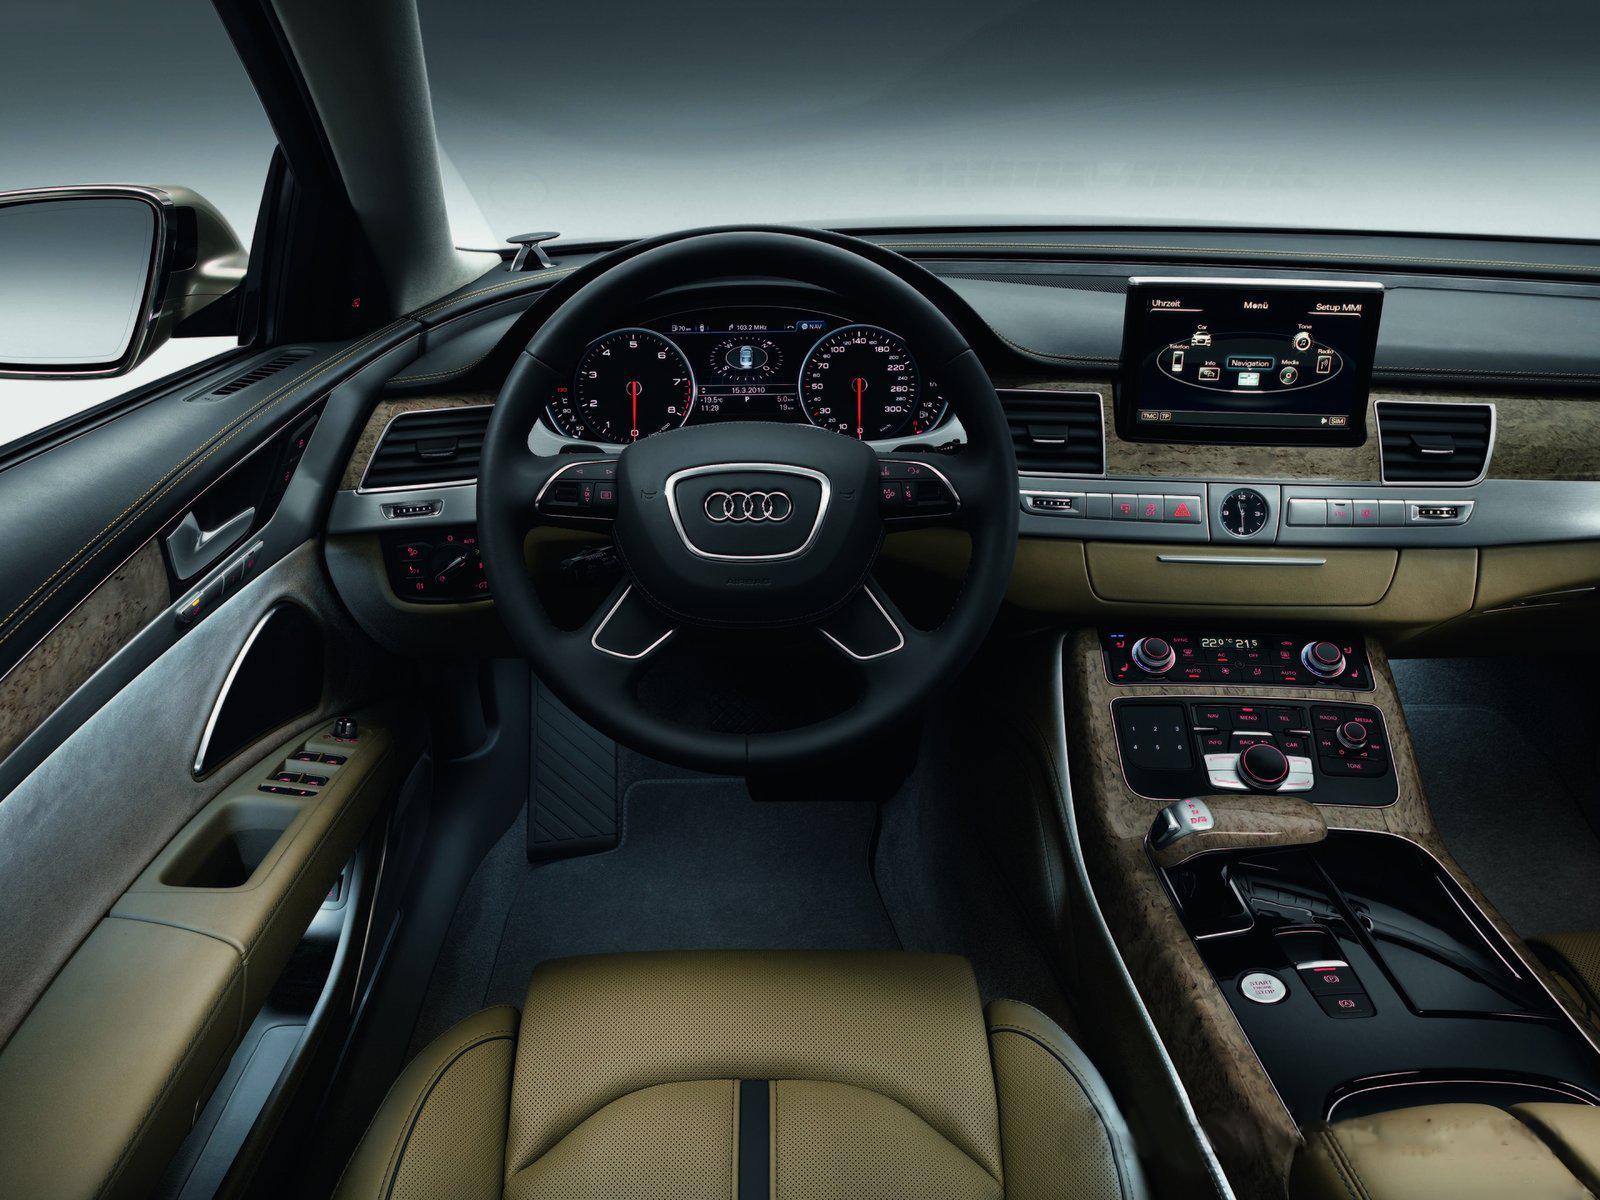 Audi S8 II (D3) Restyling 2007 - 2010 Sedan #3